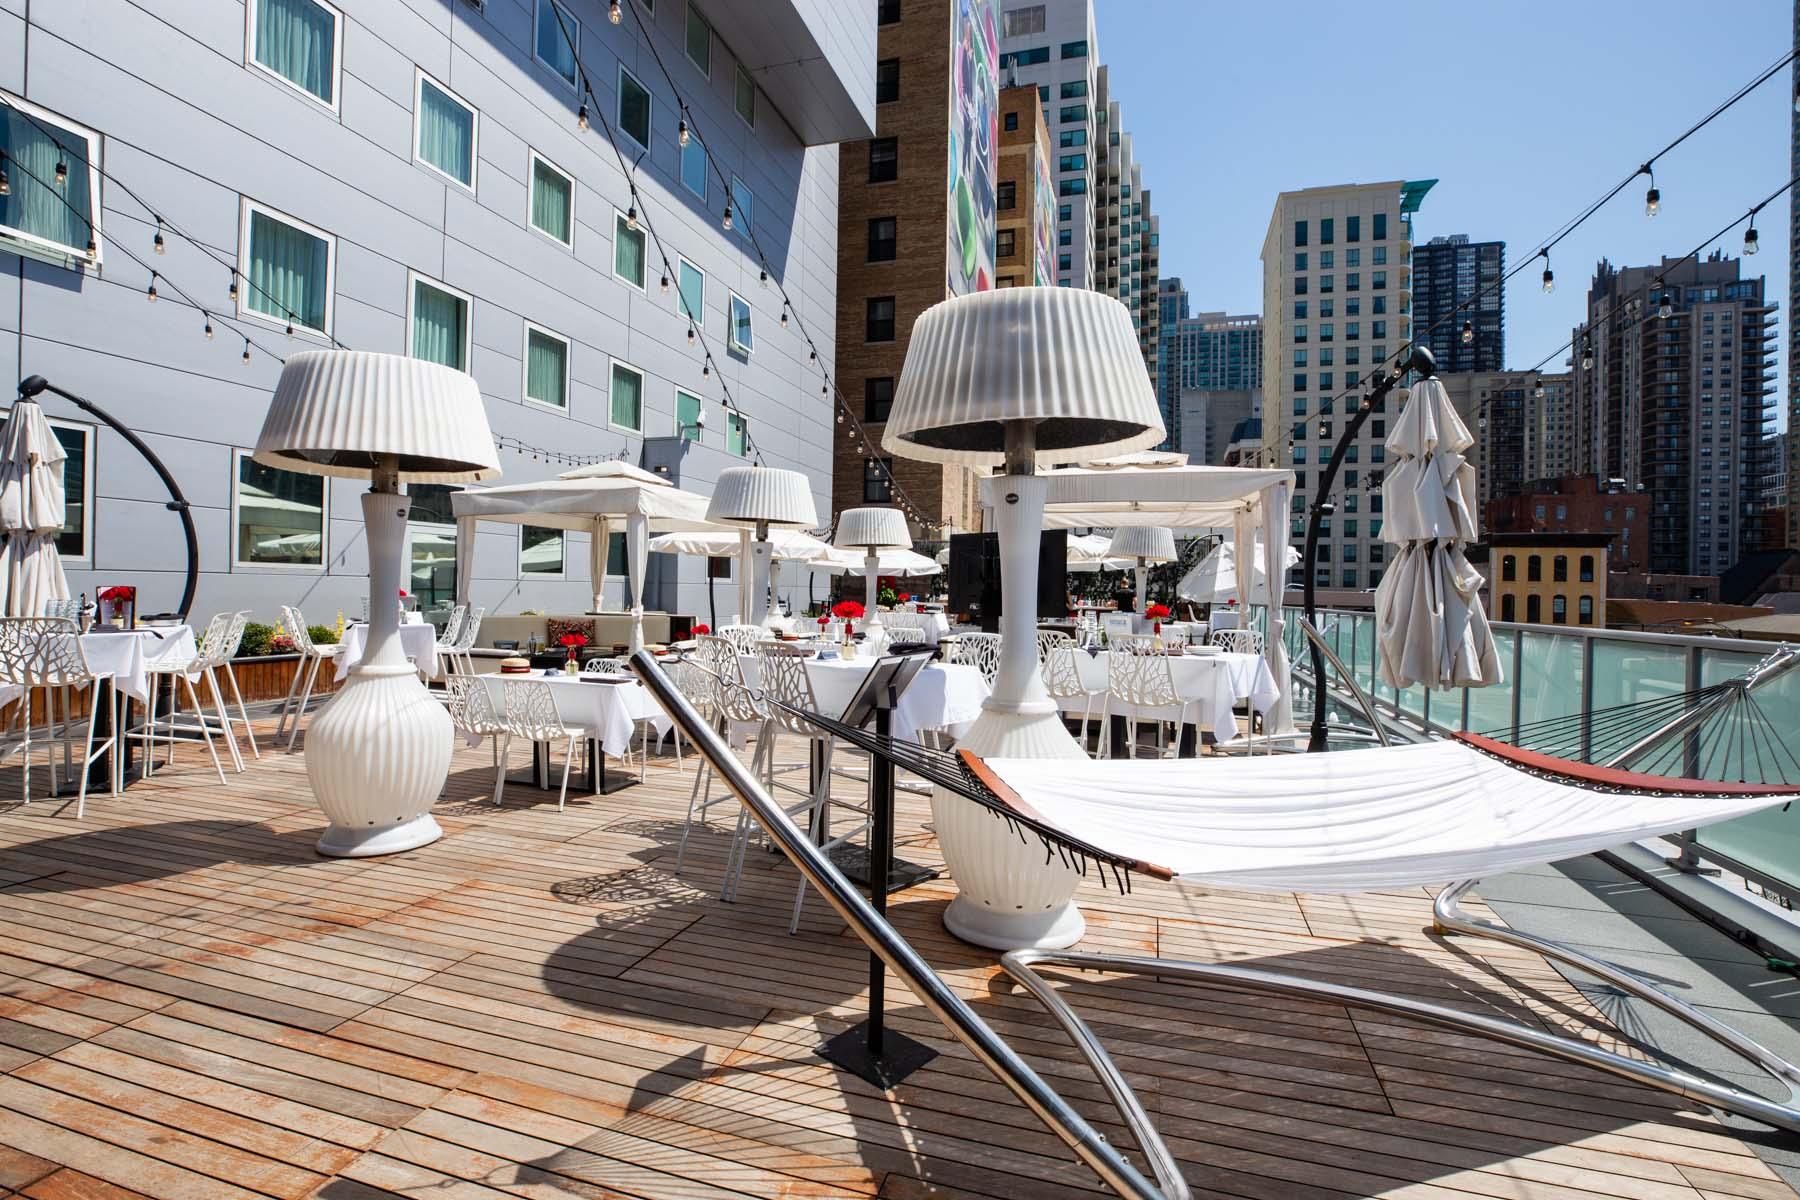 IO outdoor patio lounge